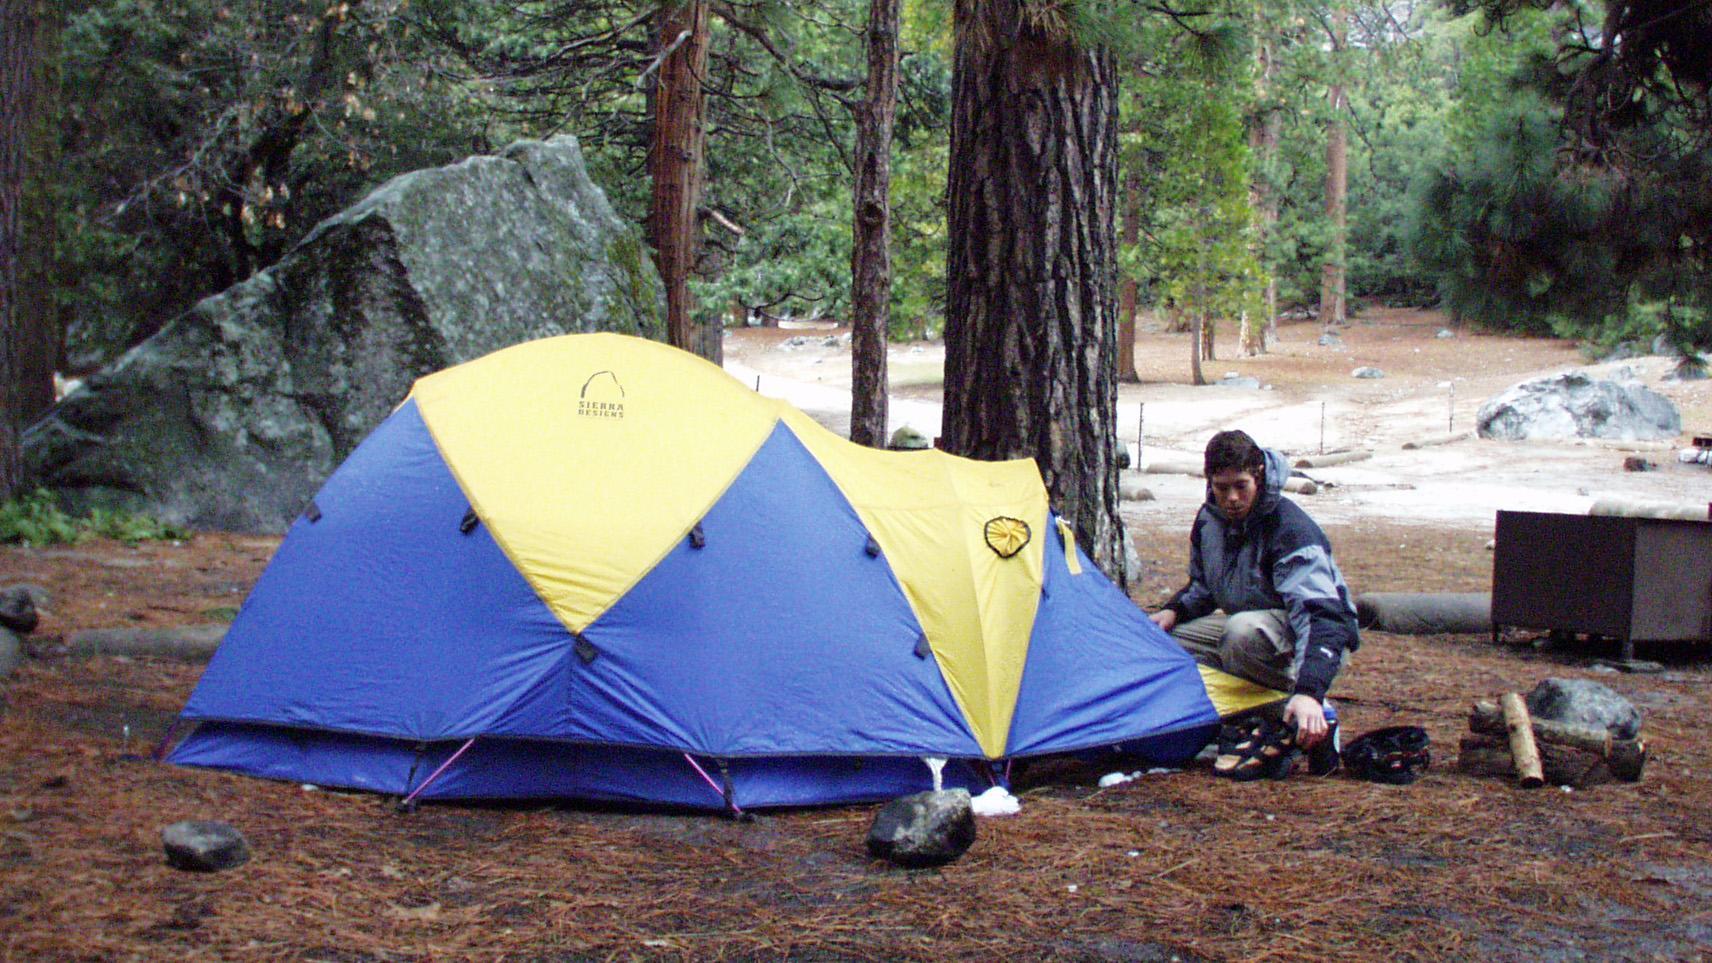 C&ing & Yosemite National Park (U.S. National Park Service)